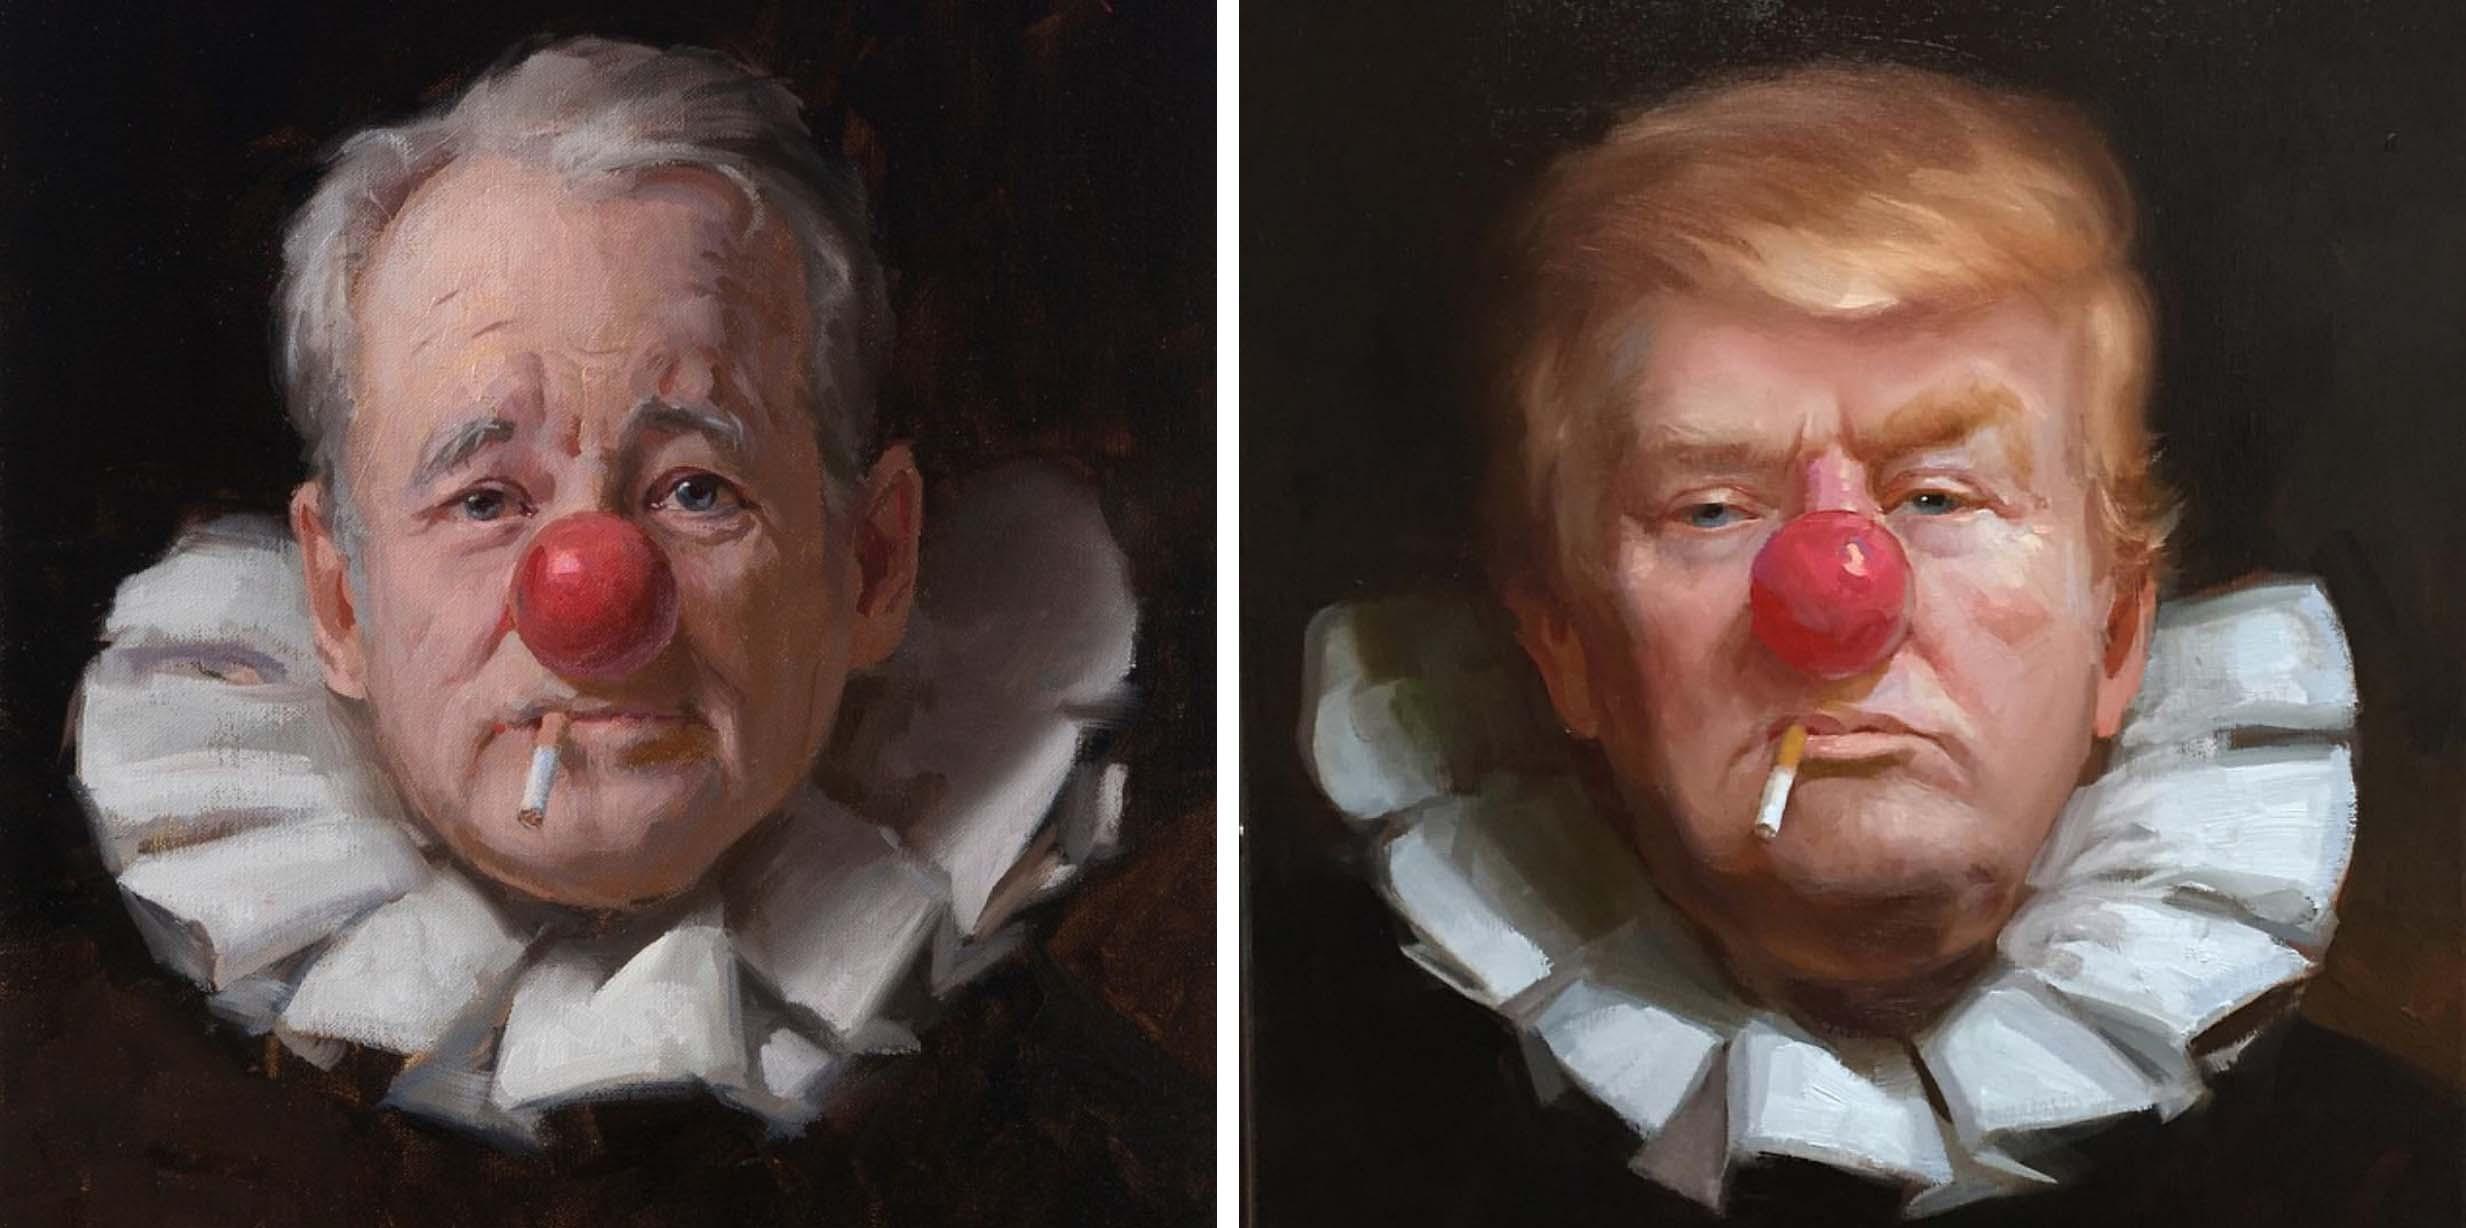 Artist Turns The Worlds Biggest Clowns Into Actual Clowns Artfido